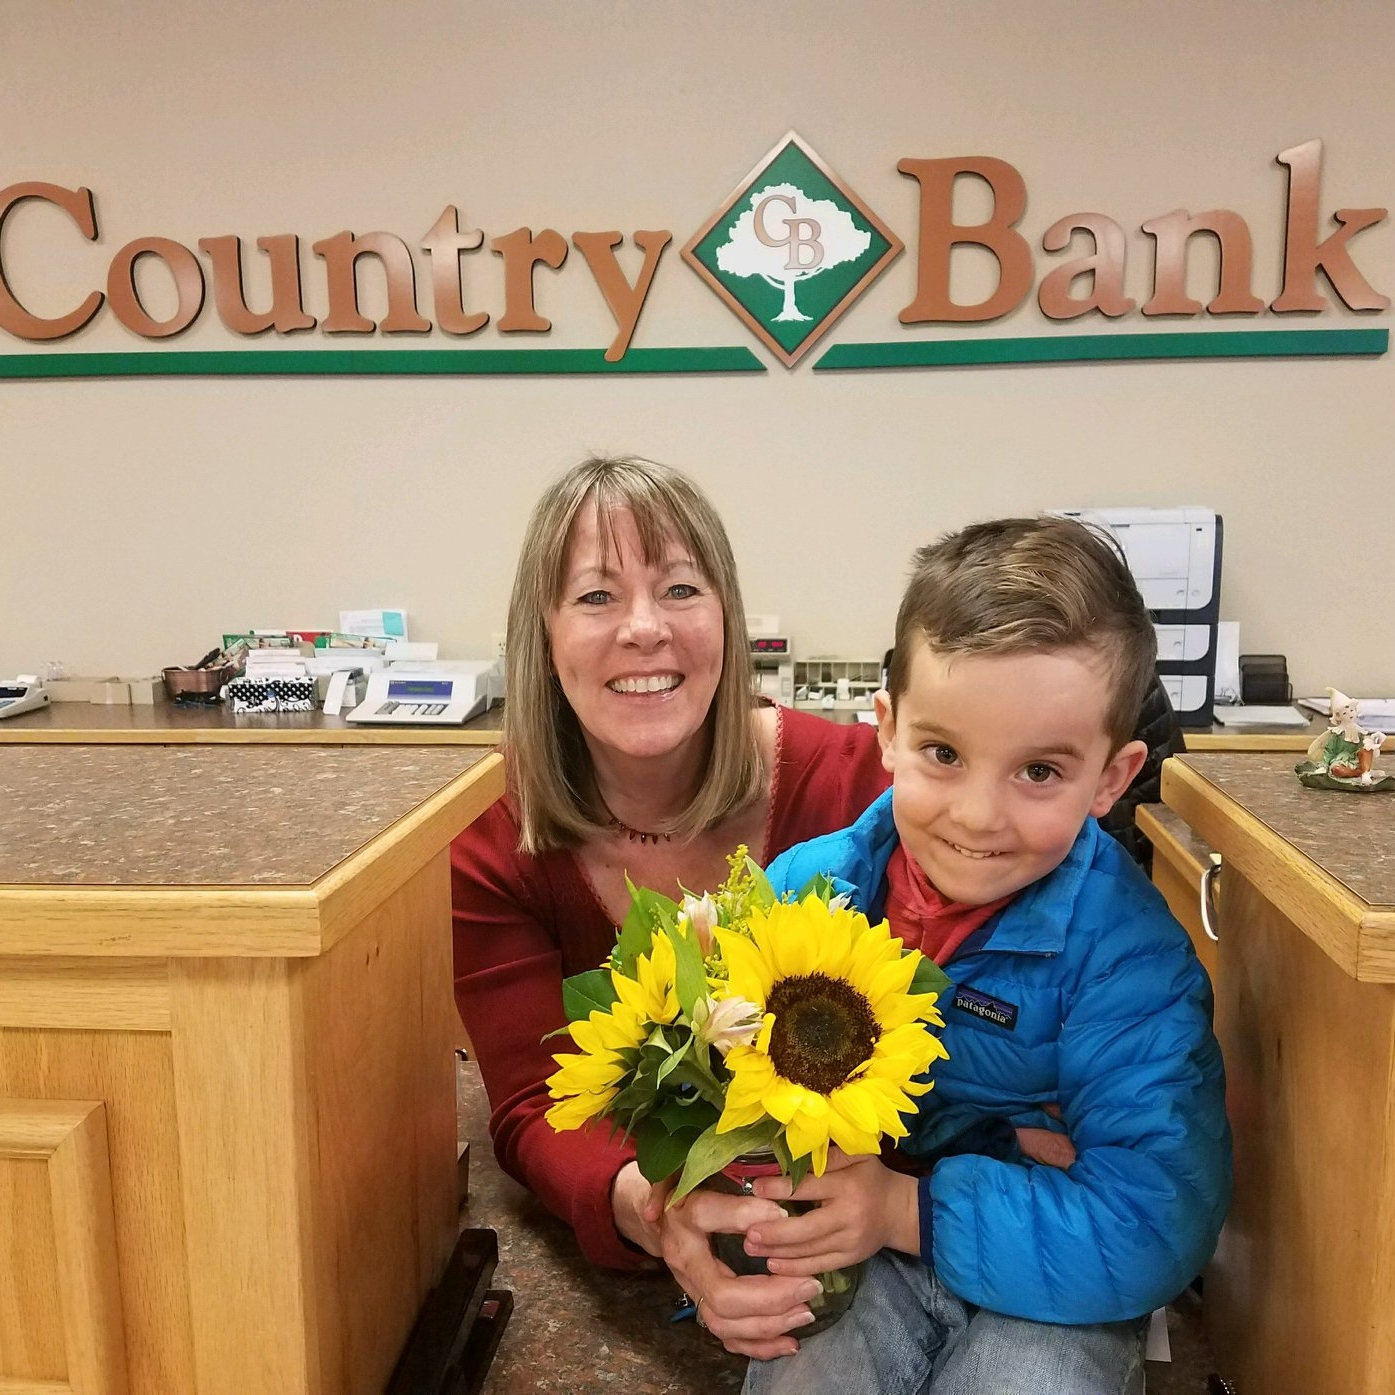 countrybank1.jpg